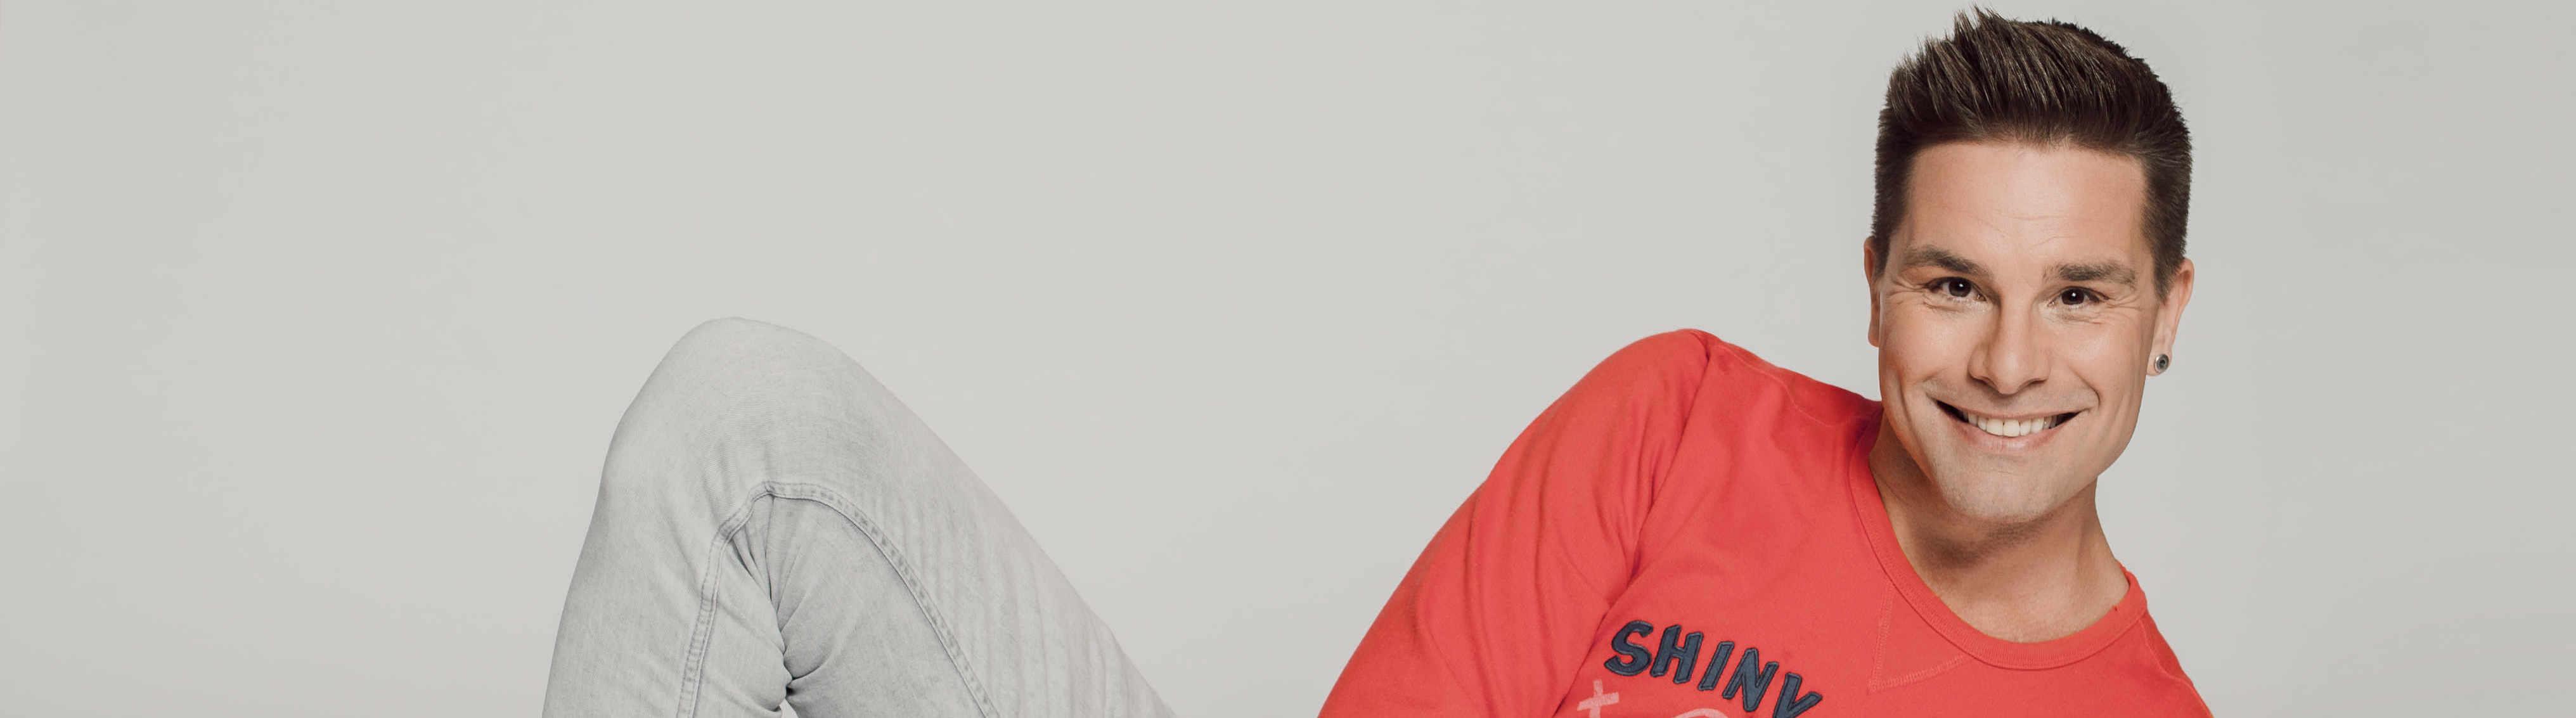 Eloy de Jong Promi Big Brother 2017 Kandidat Bewohner Eloy Promi BB